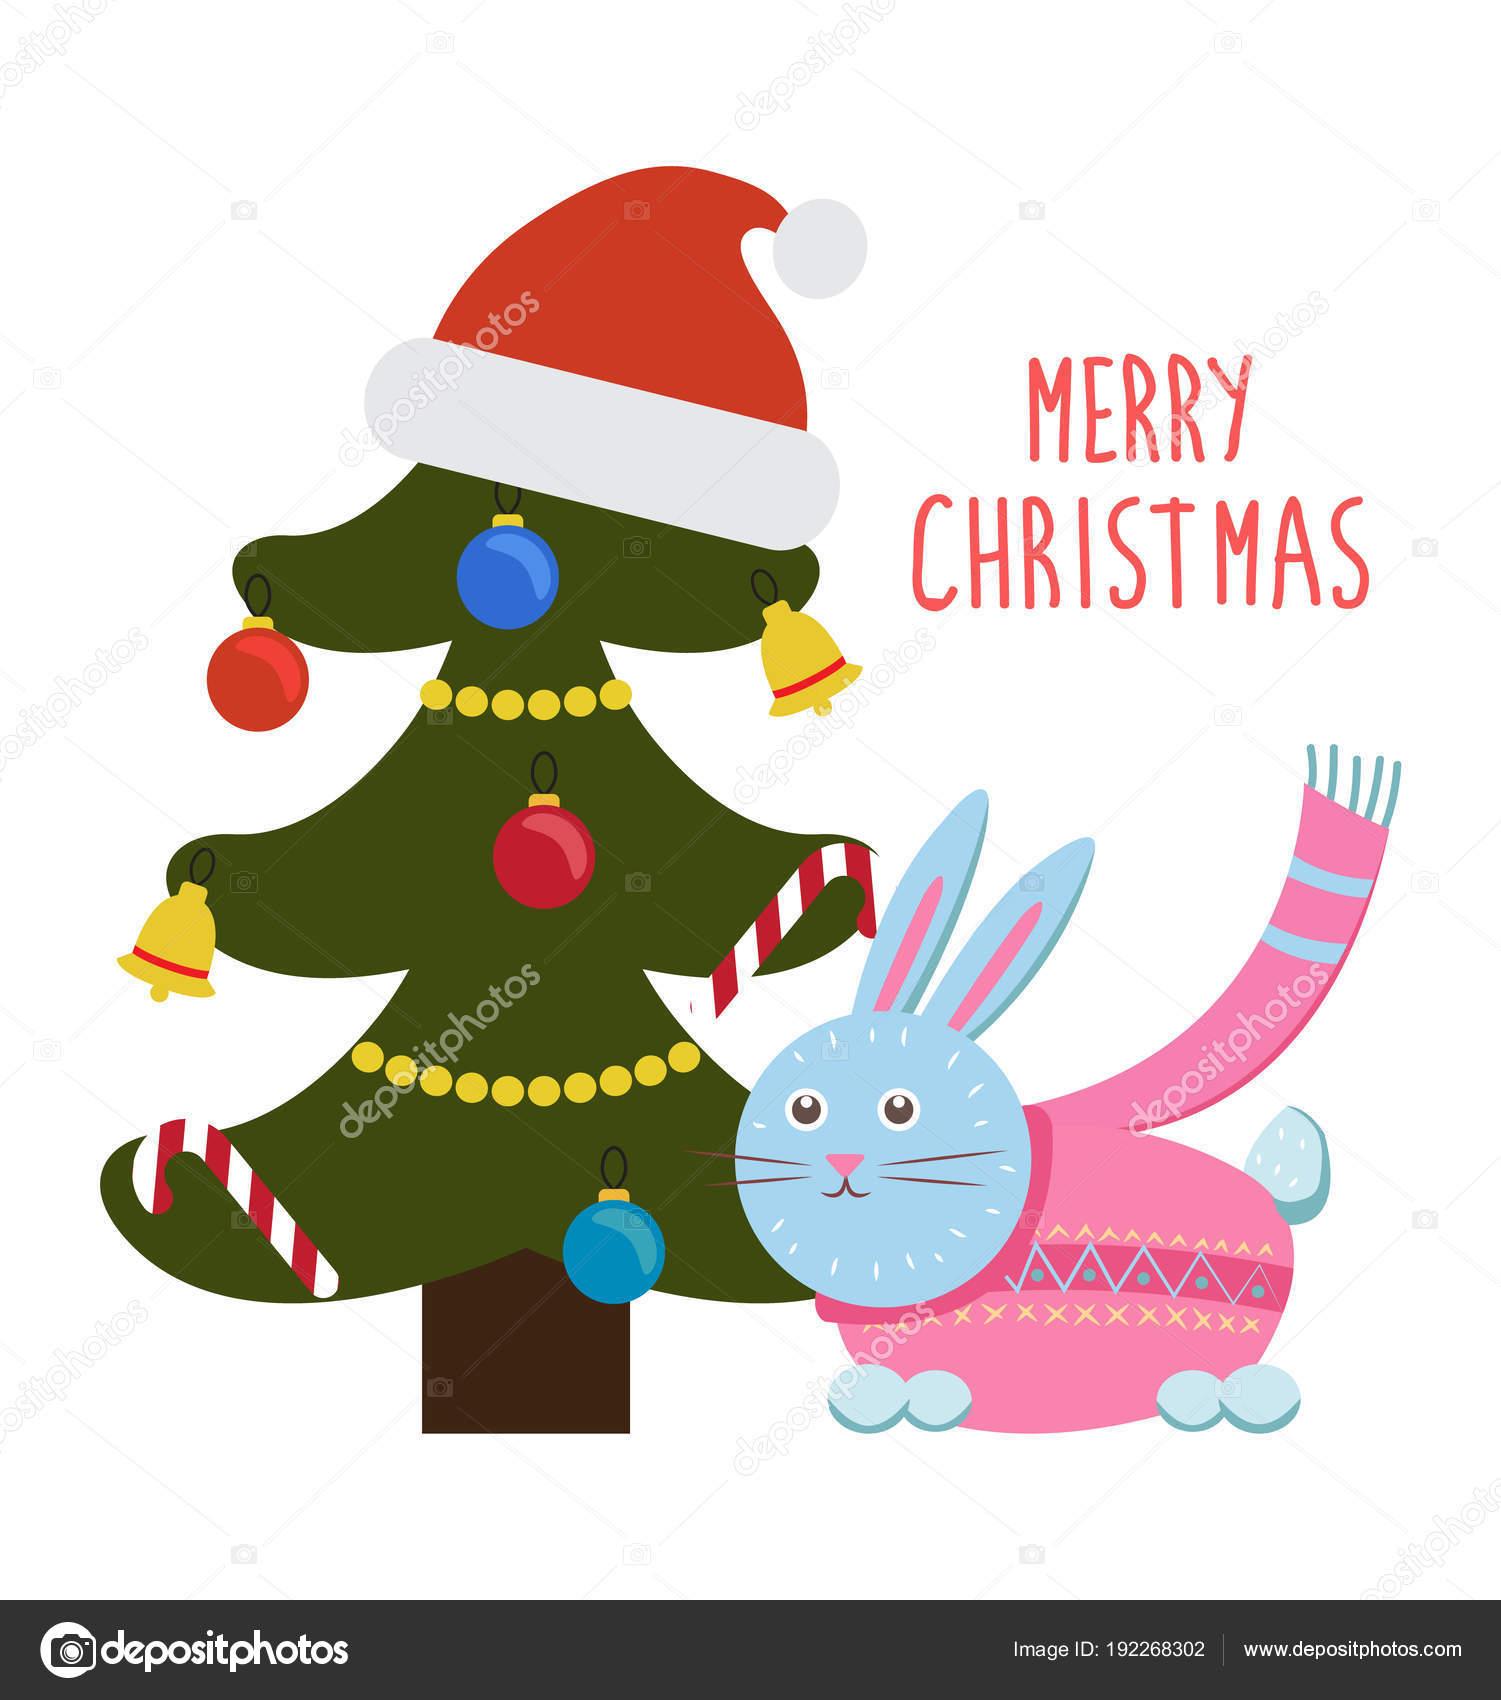 Frohe Weihnachten Grüße.Frohe Weihnachten Grüße Cartoon Hase Kaninchen Baum Stockvektor